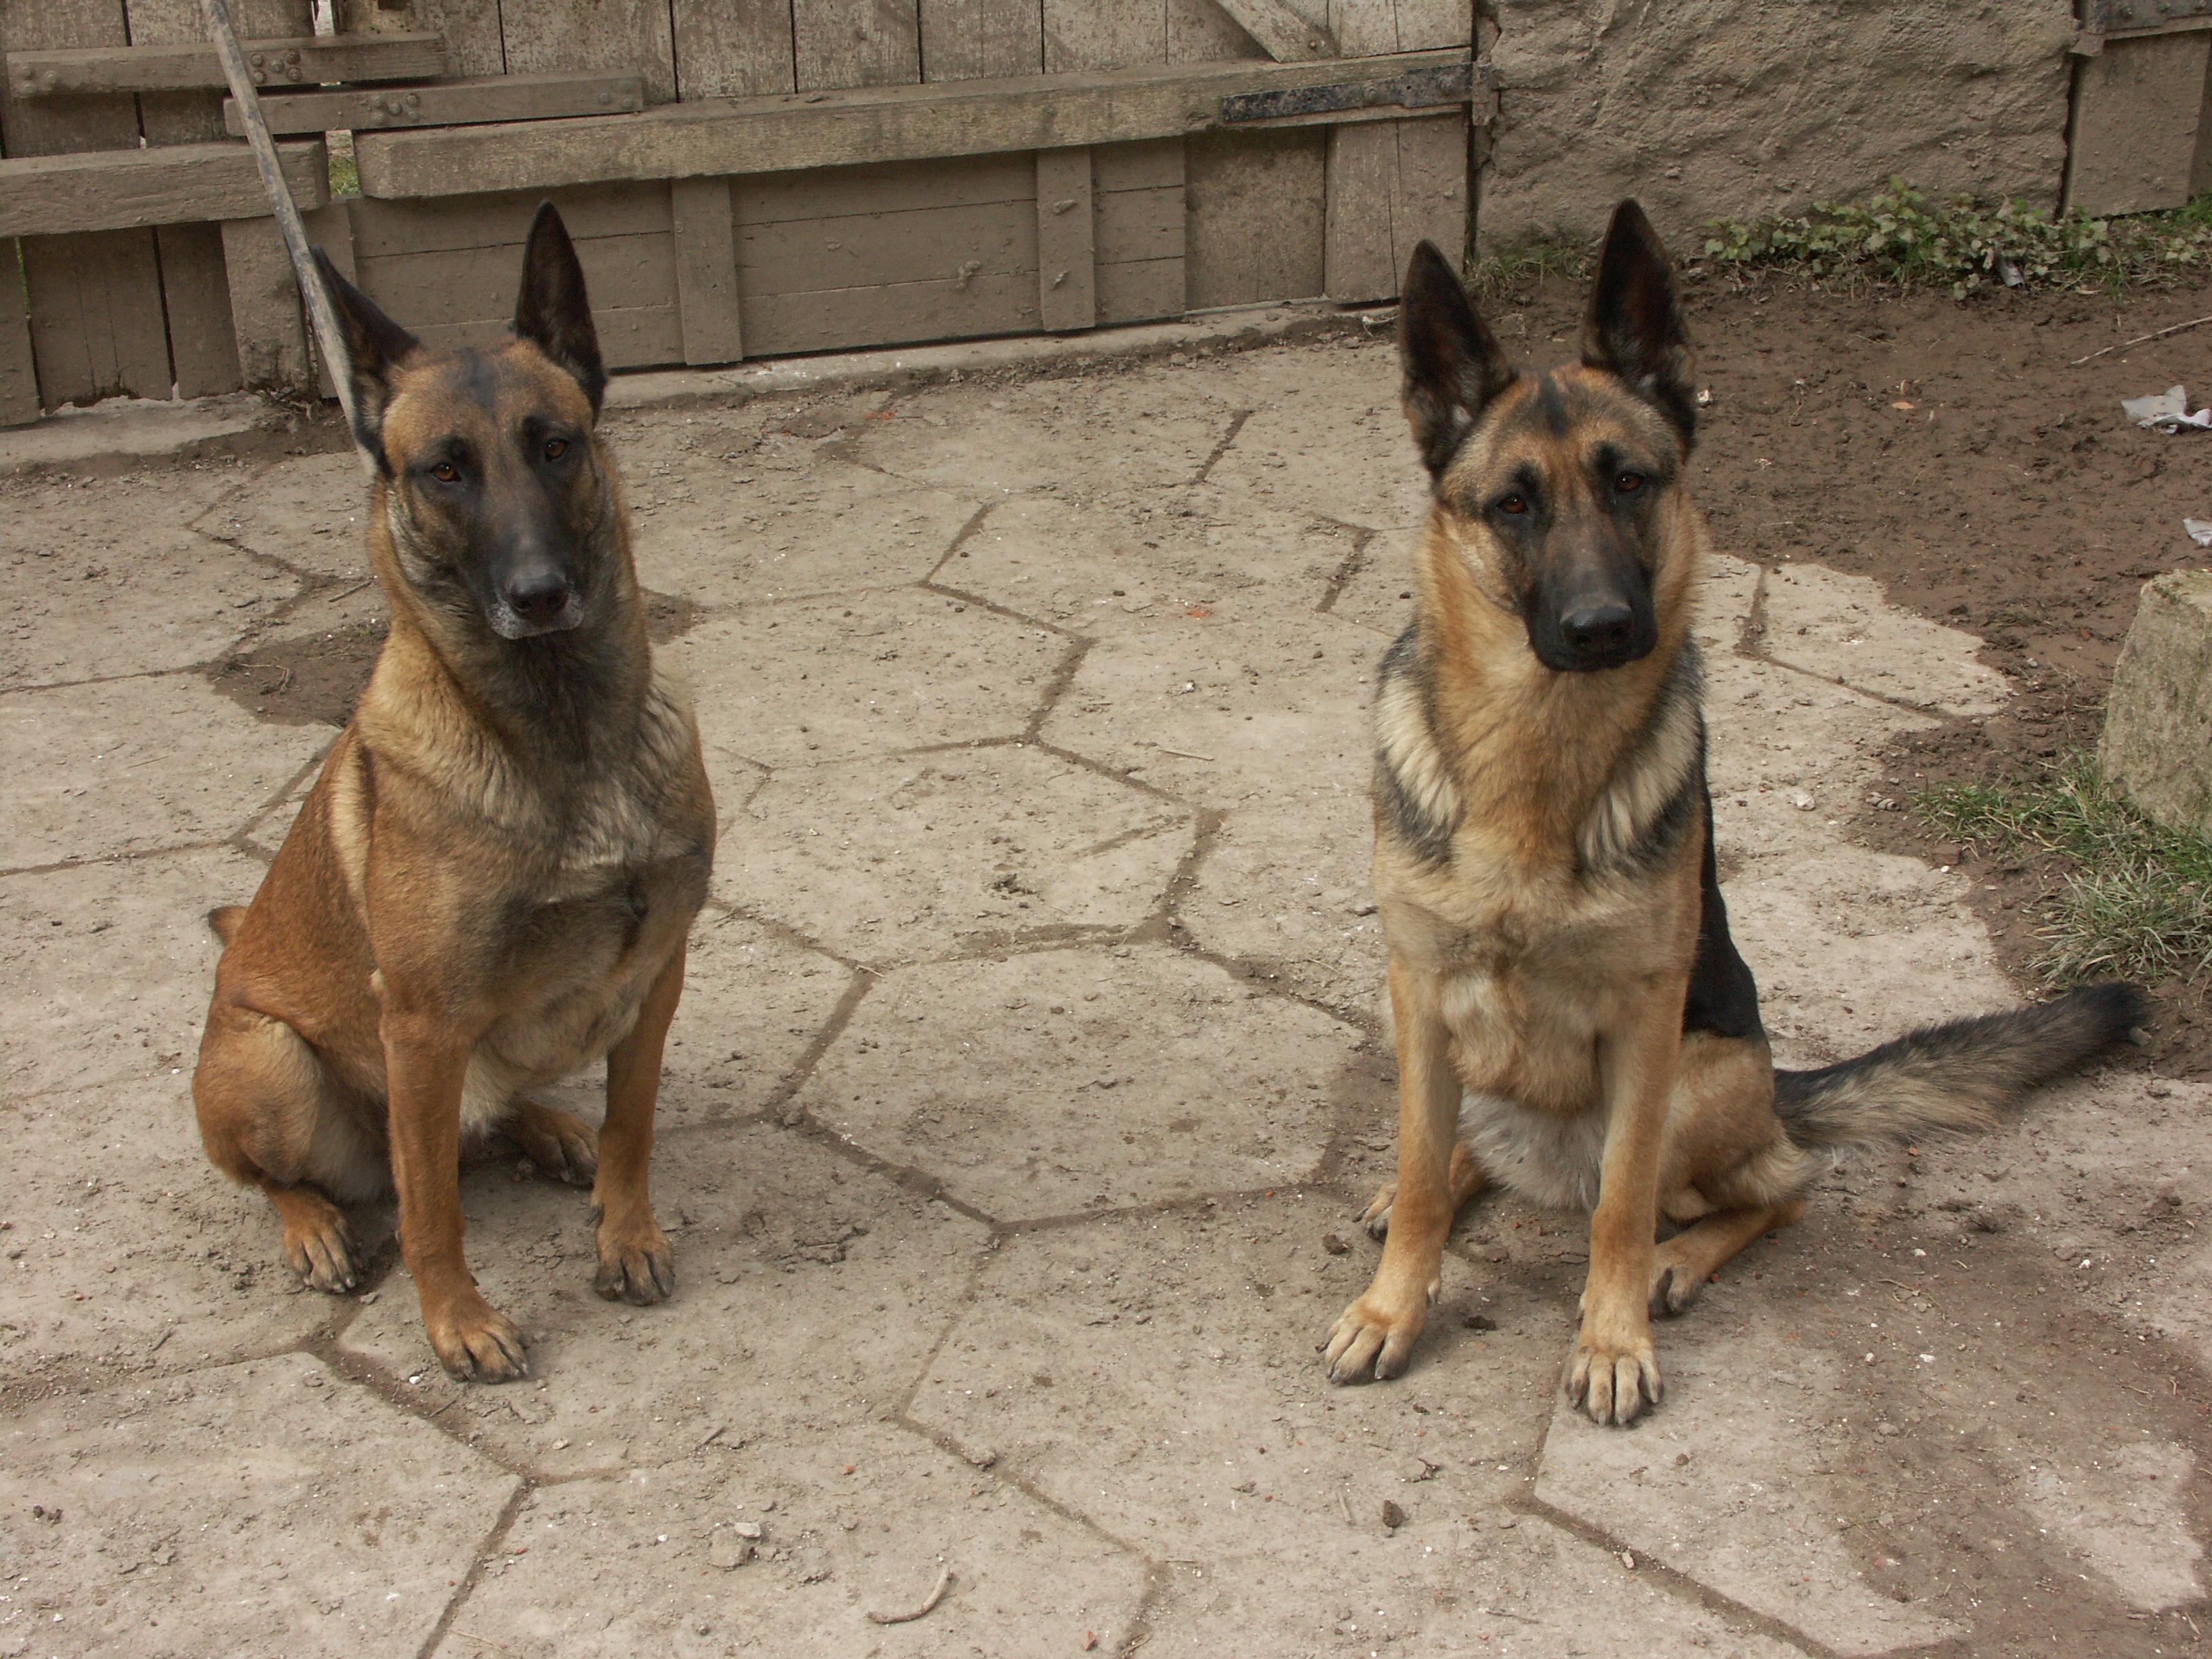 mes deux chiennes vont mourir... - Page 4 54826420050313004ScaryUlna